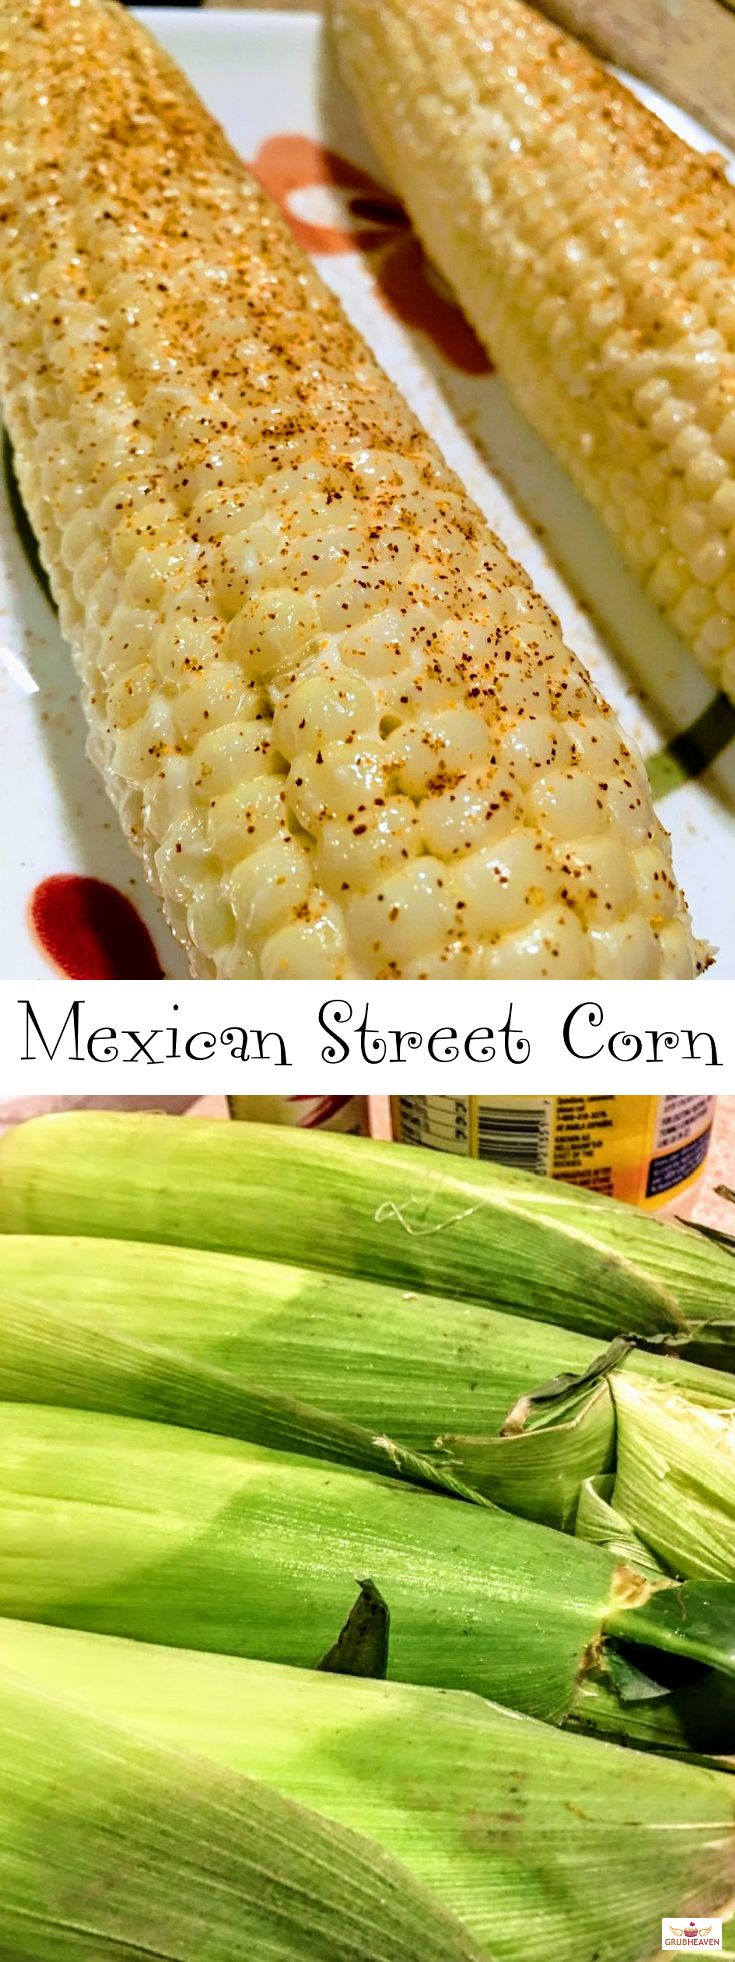 http://www.grubheaven.com/?osetin_recipe=mexican-street-corn http://www.grubheaven.com/?osetin_recipe=mexican-street-corn